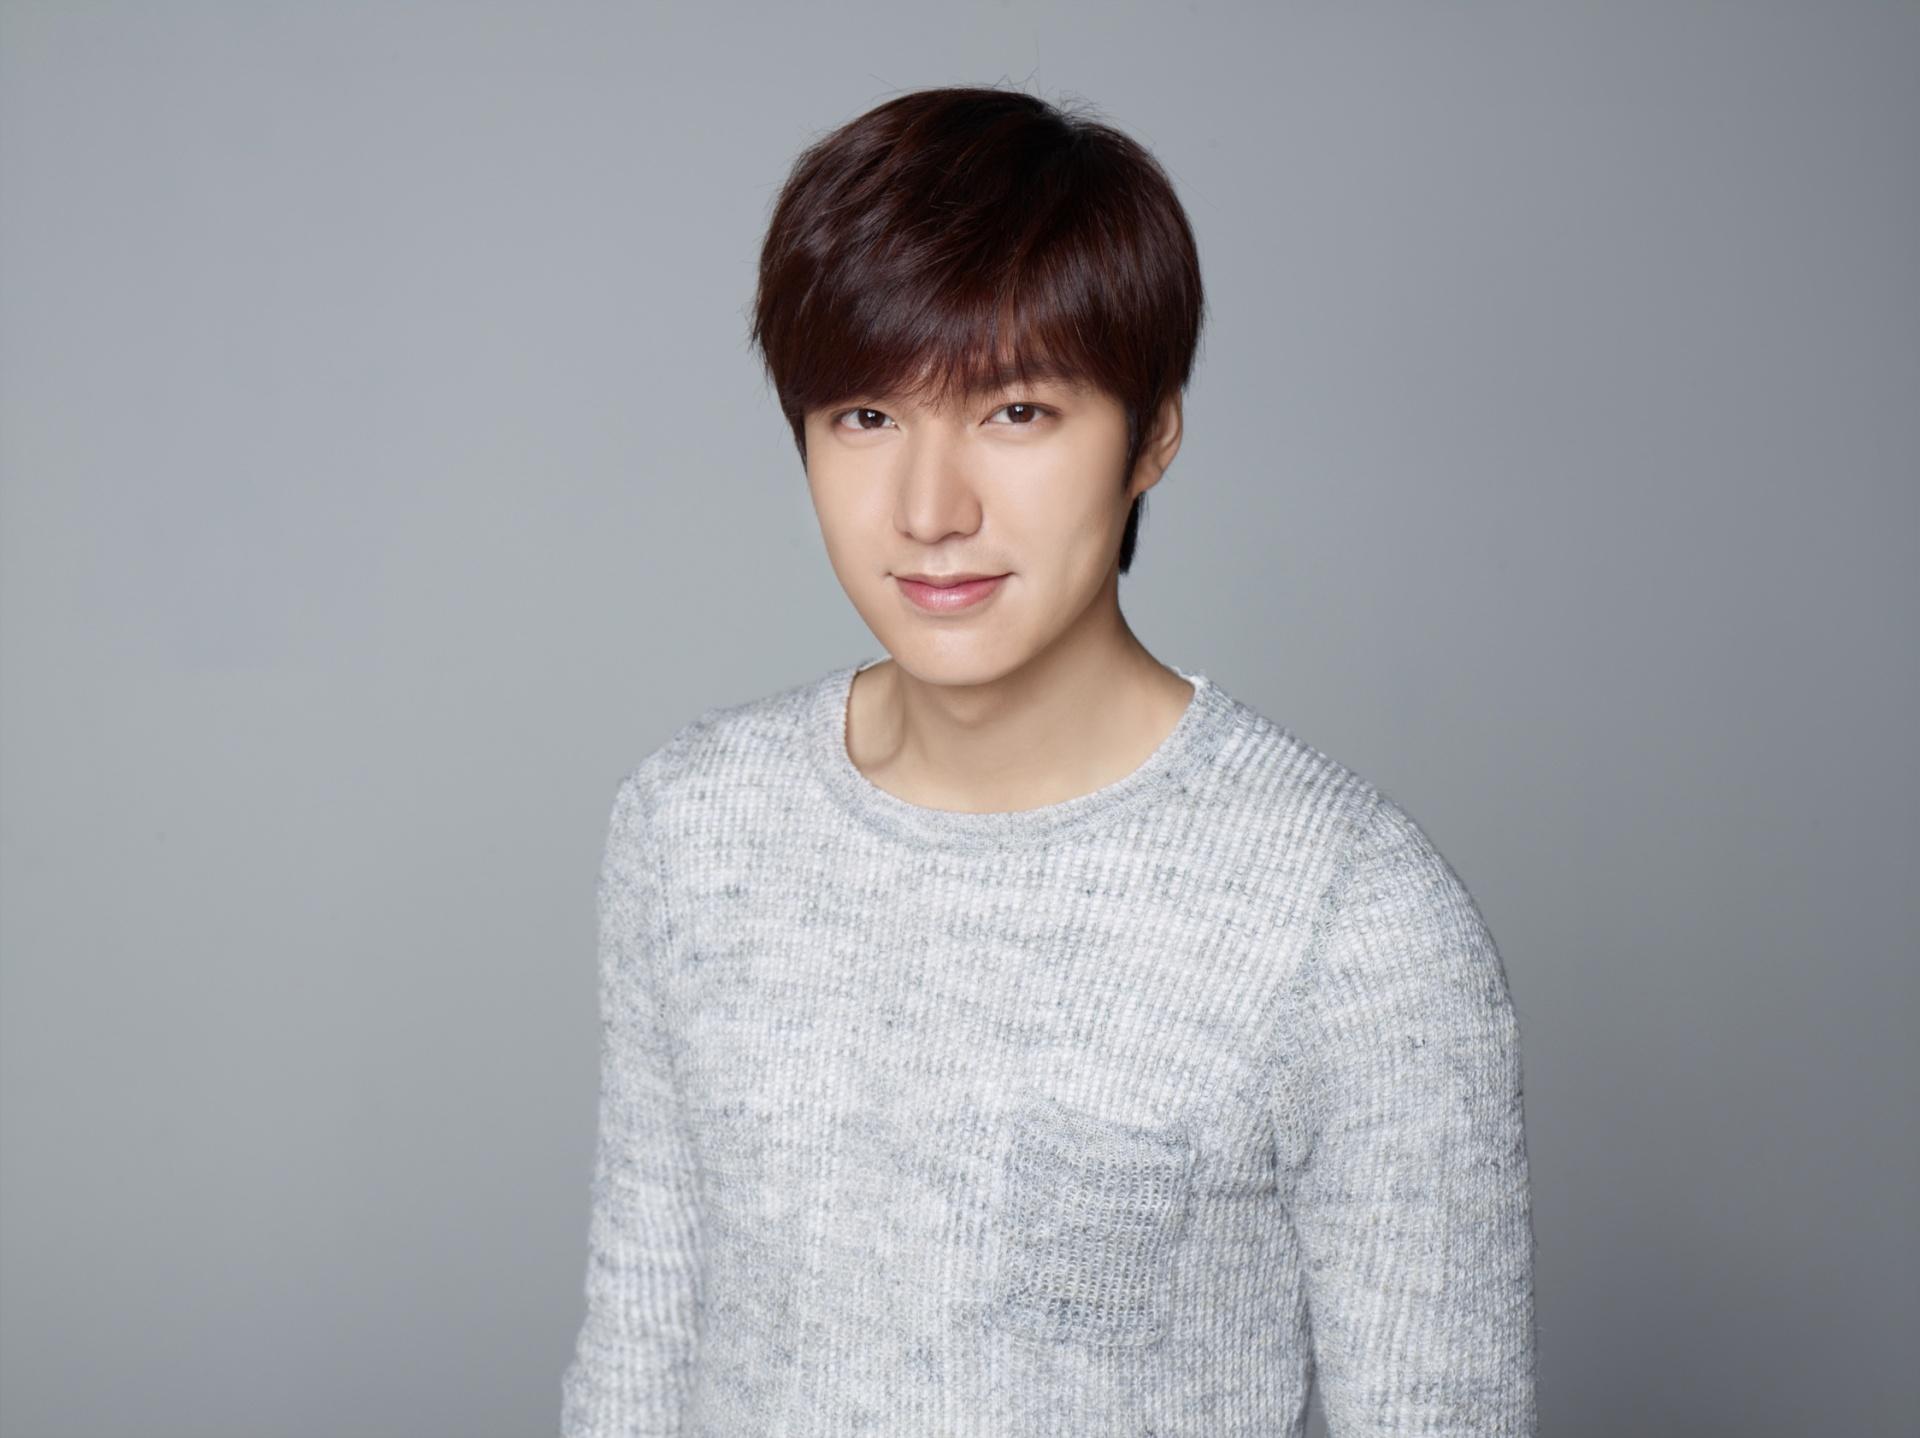 Lee Min Ho LG Taiwan